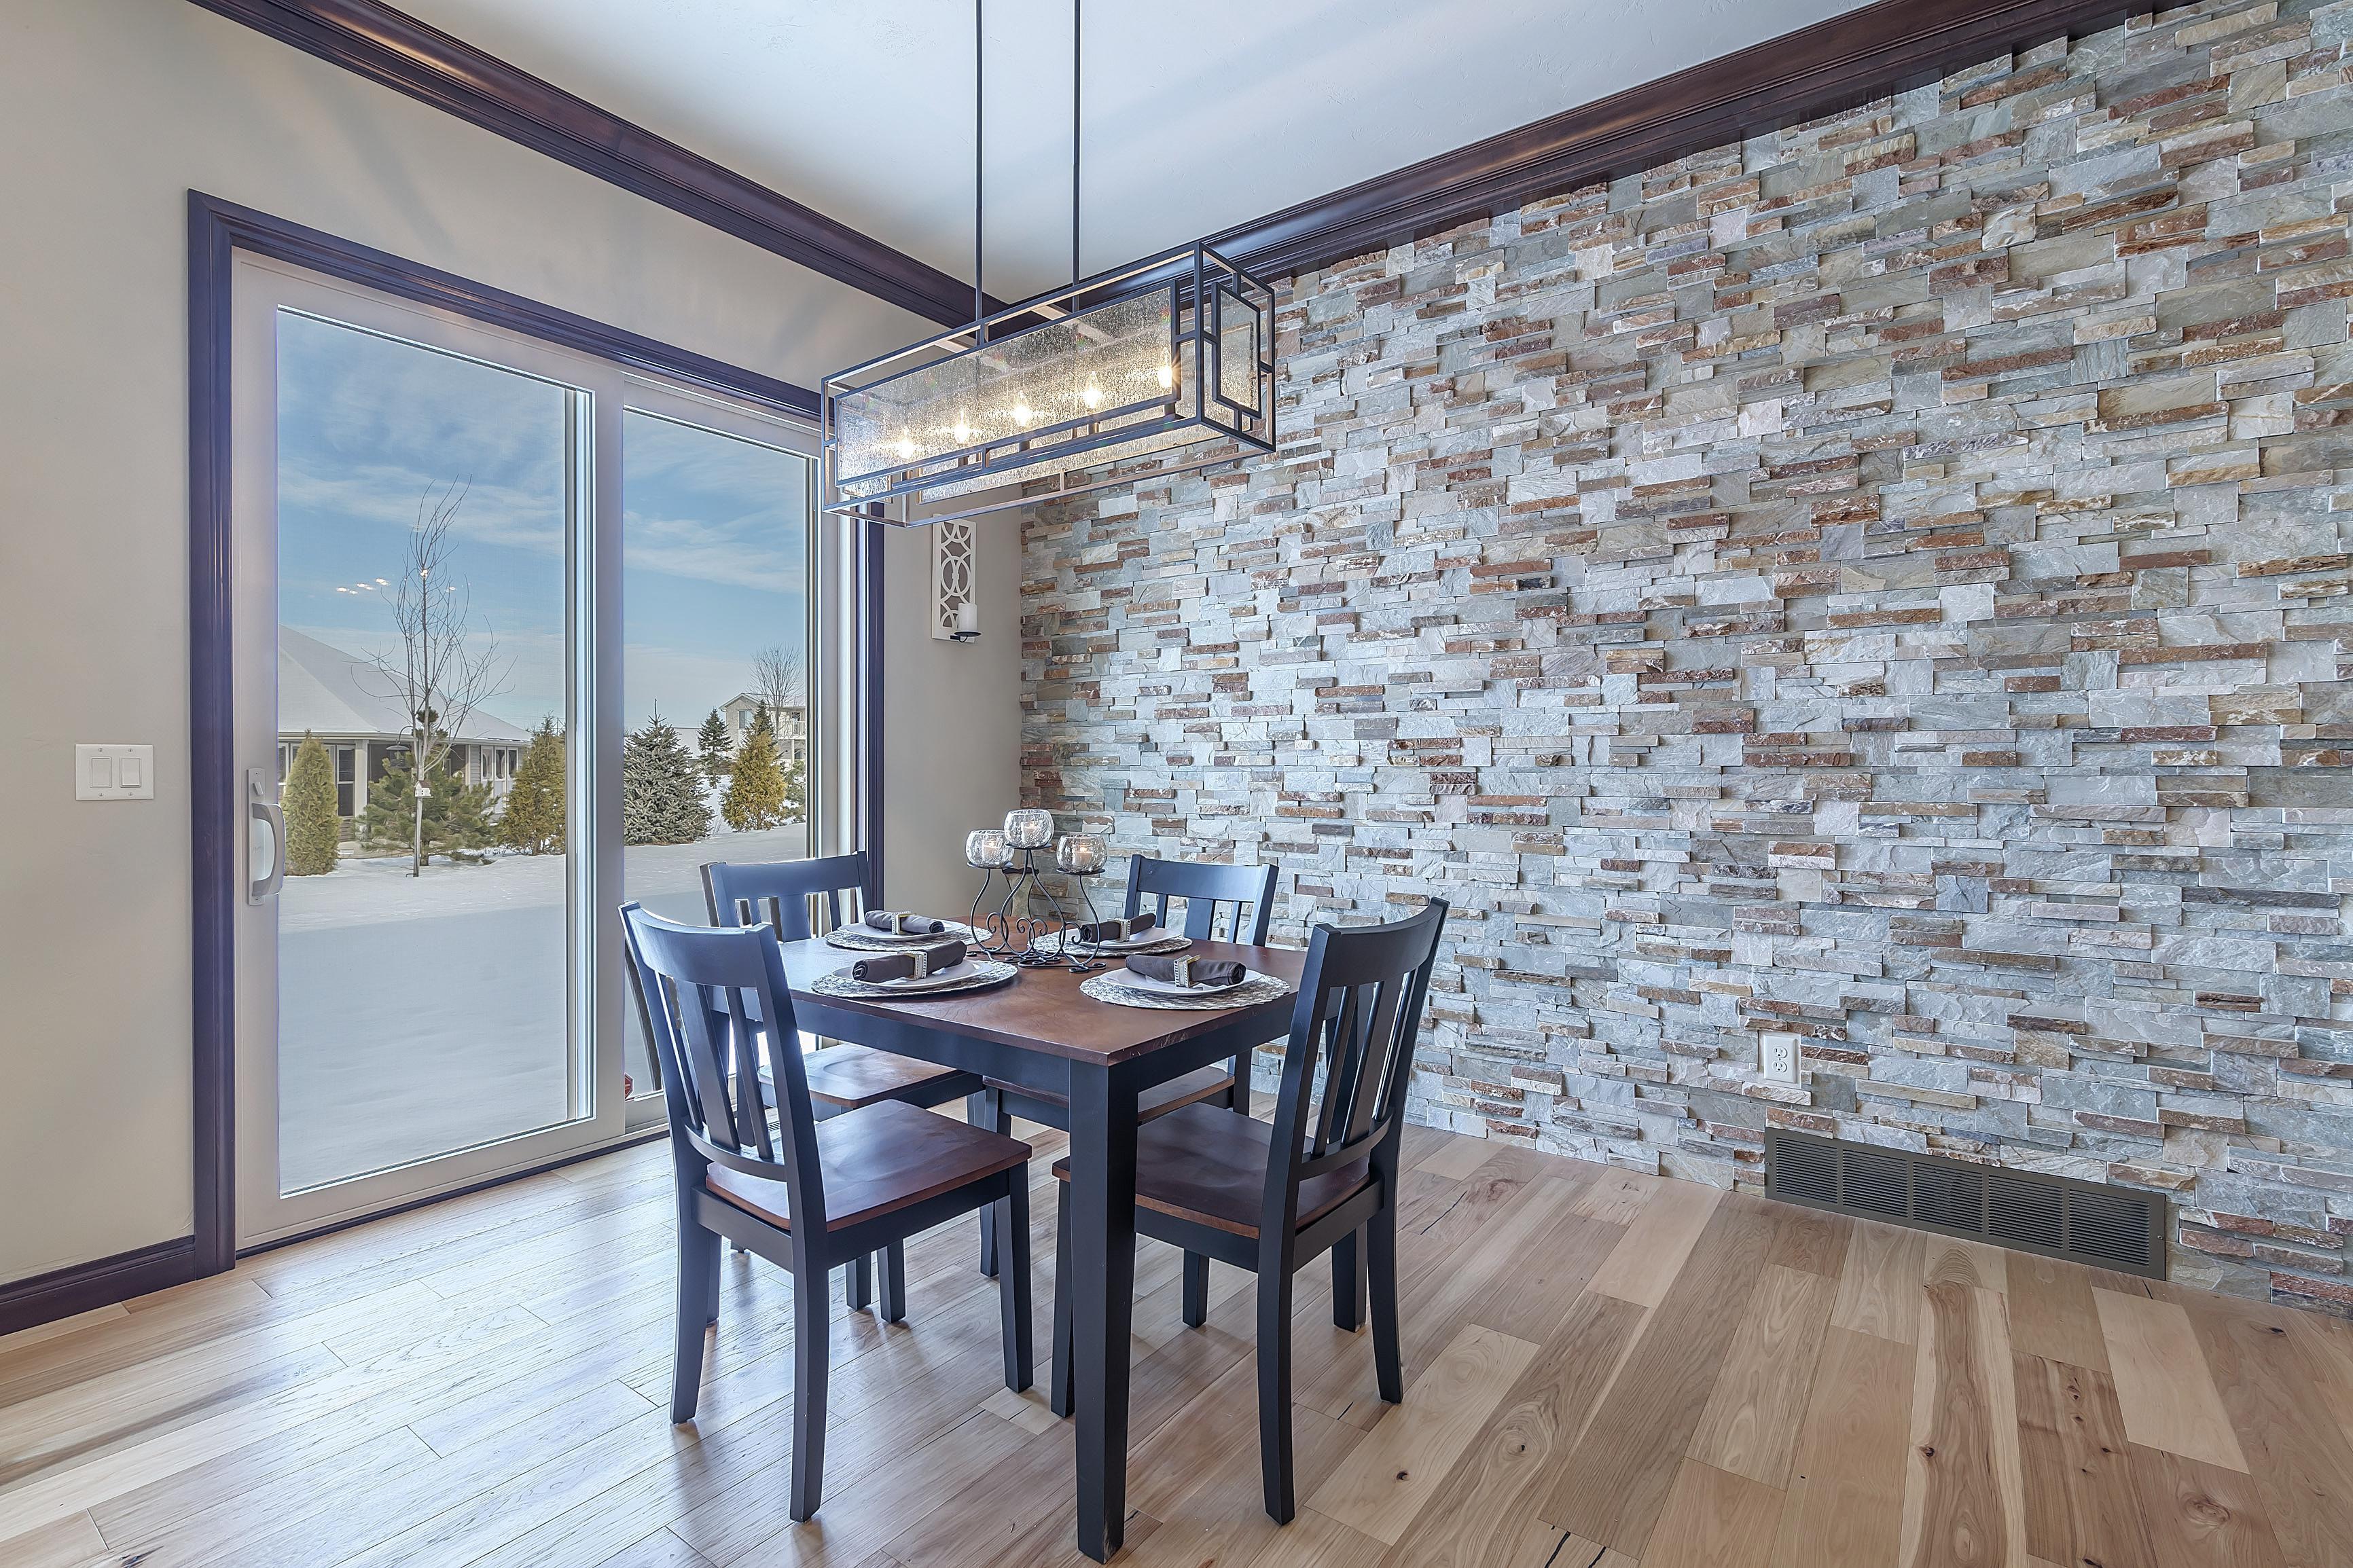 Dining Room with Masonry Wall